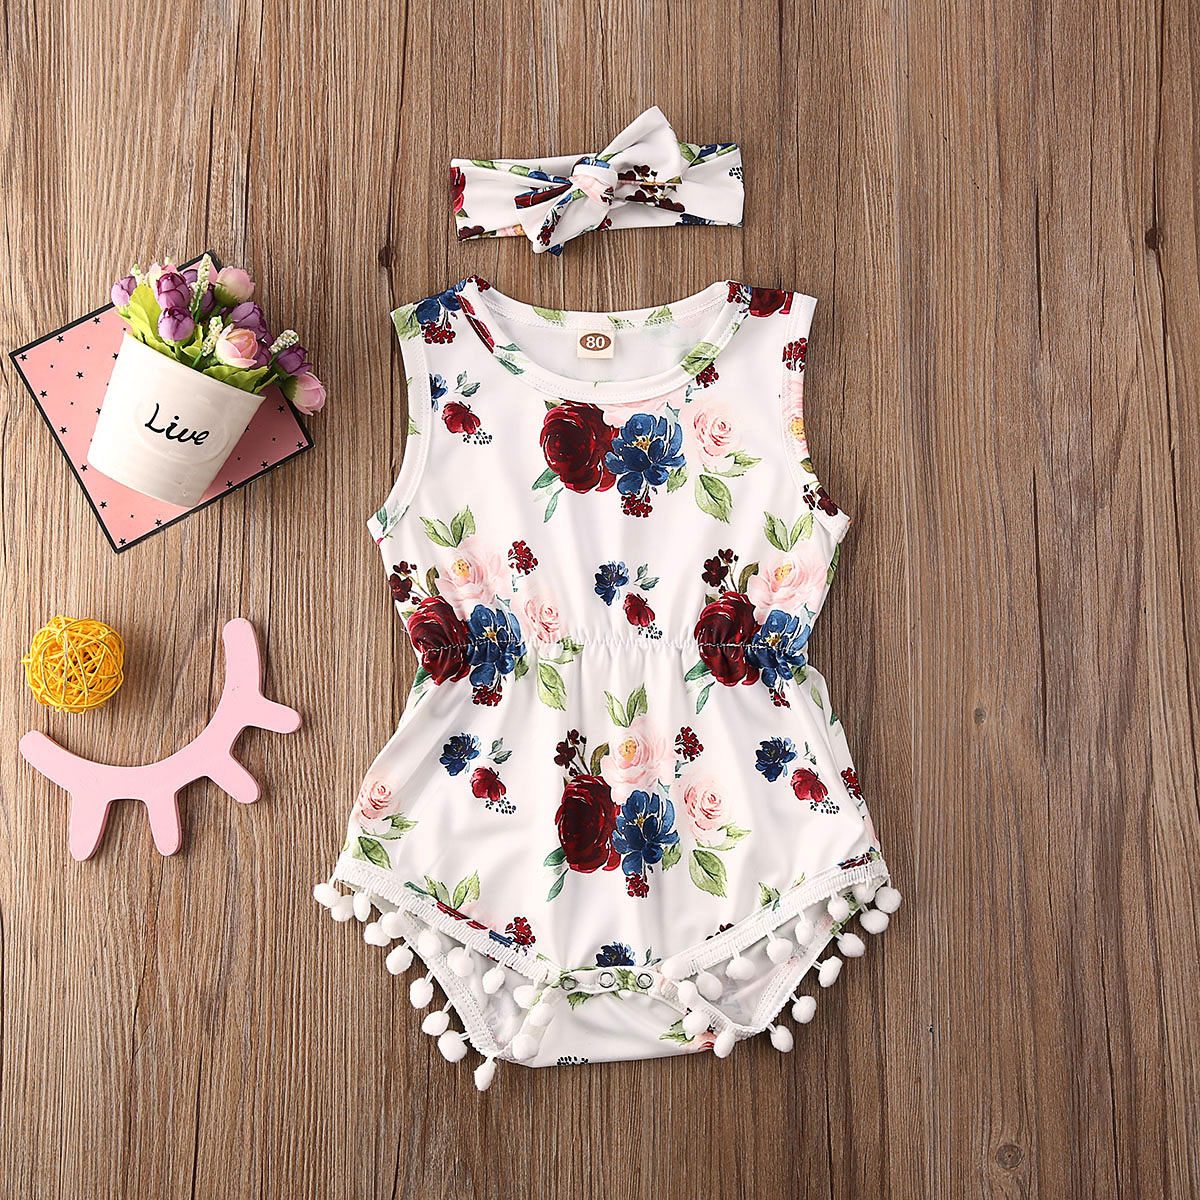 US Newborn Baby Girls Cotton Romper Bodysuit Jumpsuit Flower Pants Hat Headband